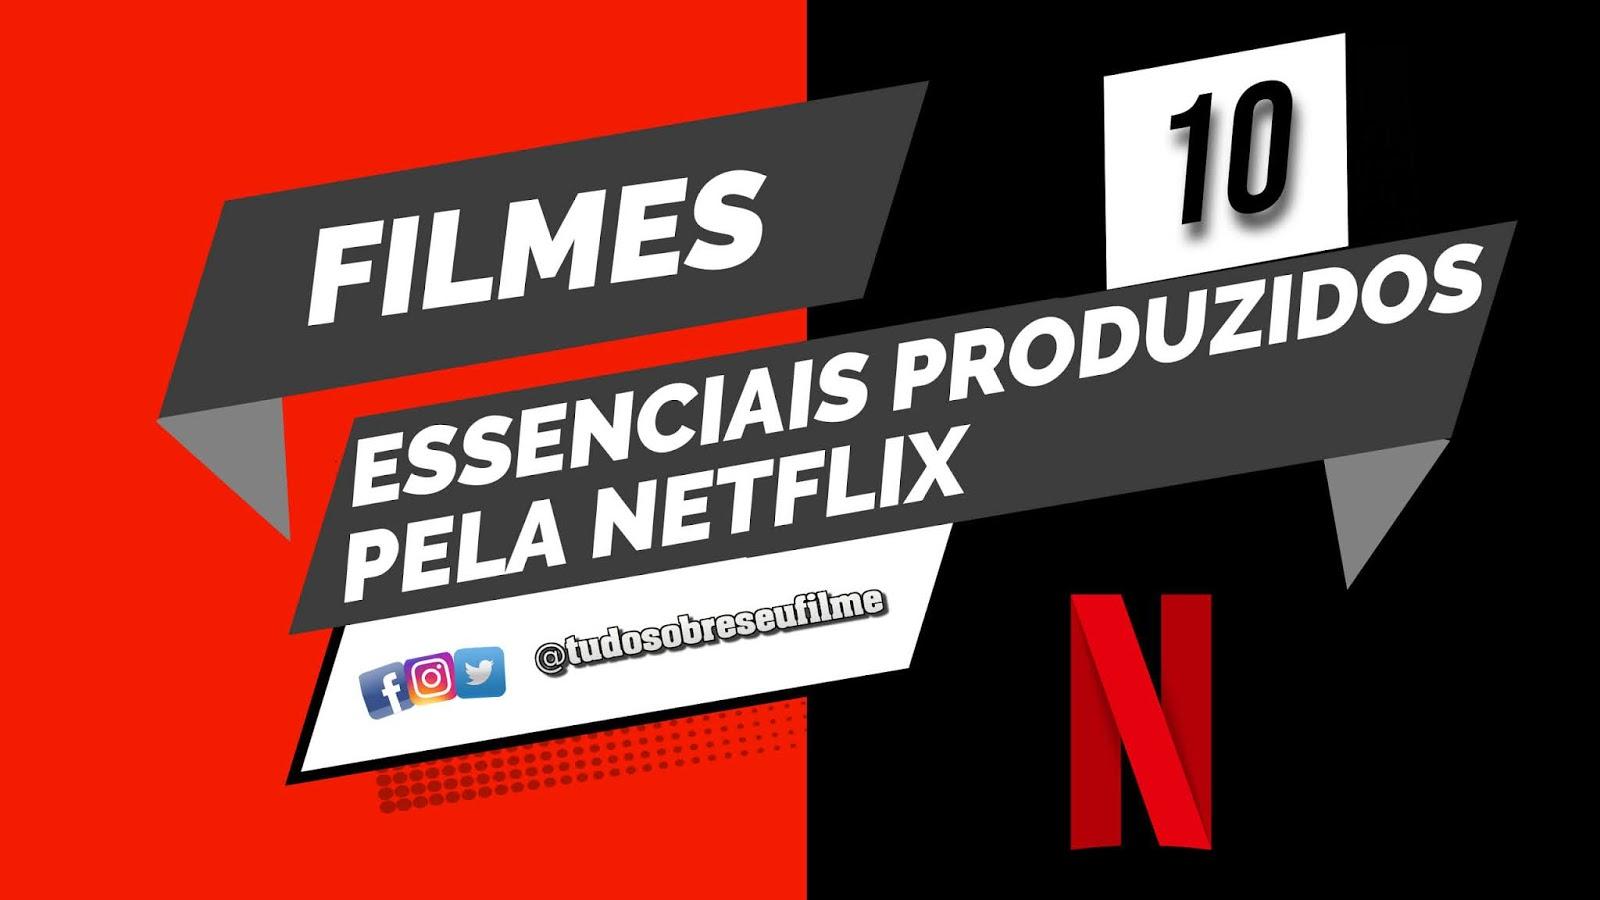 10-best-netflix-movies-so-far